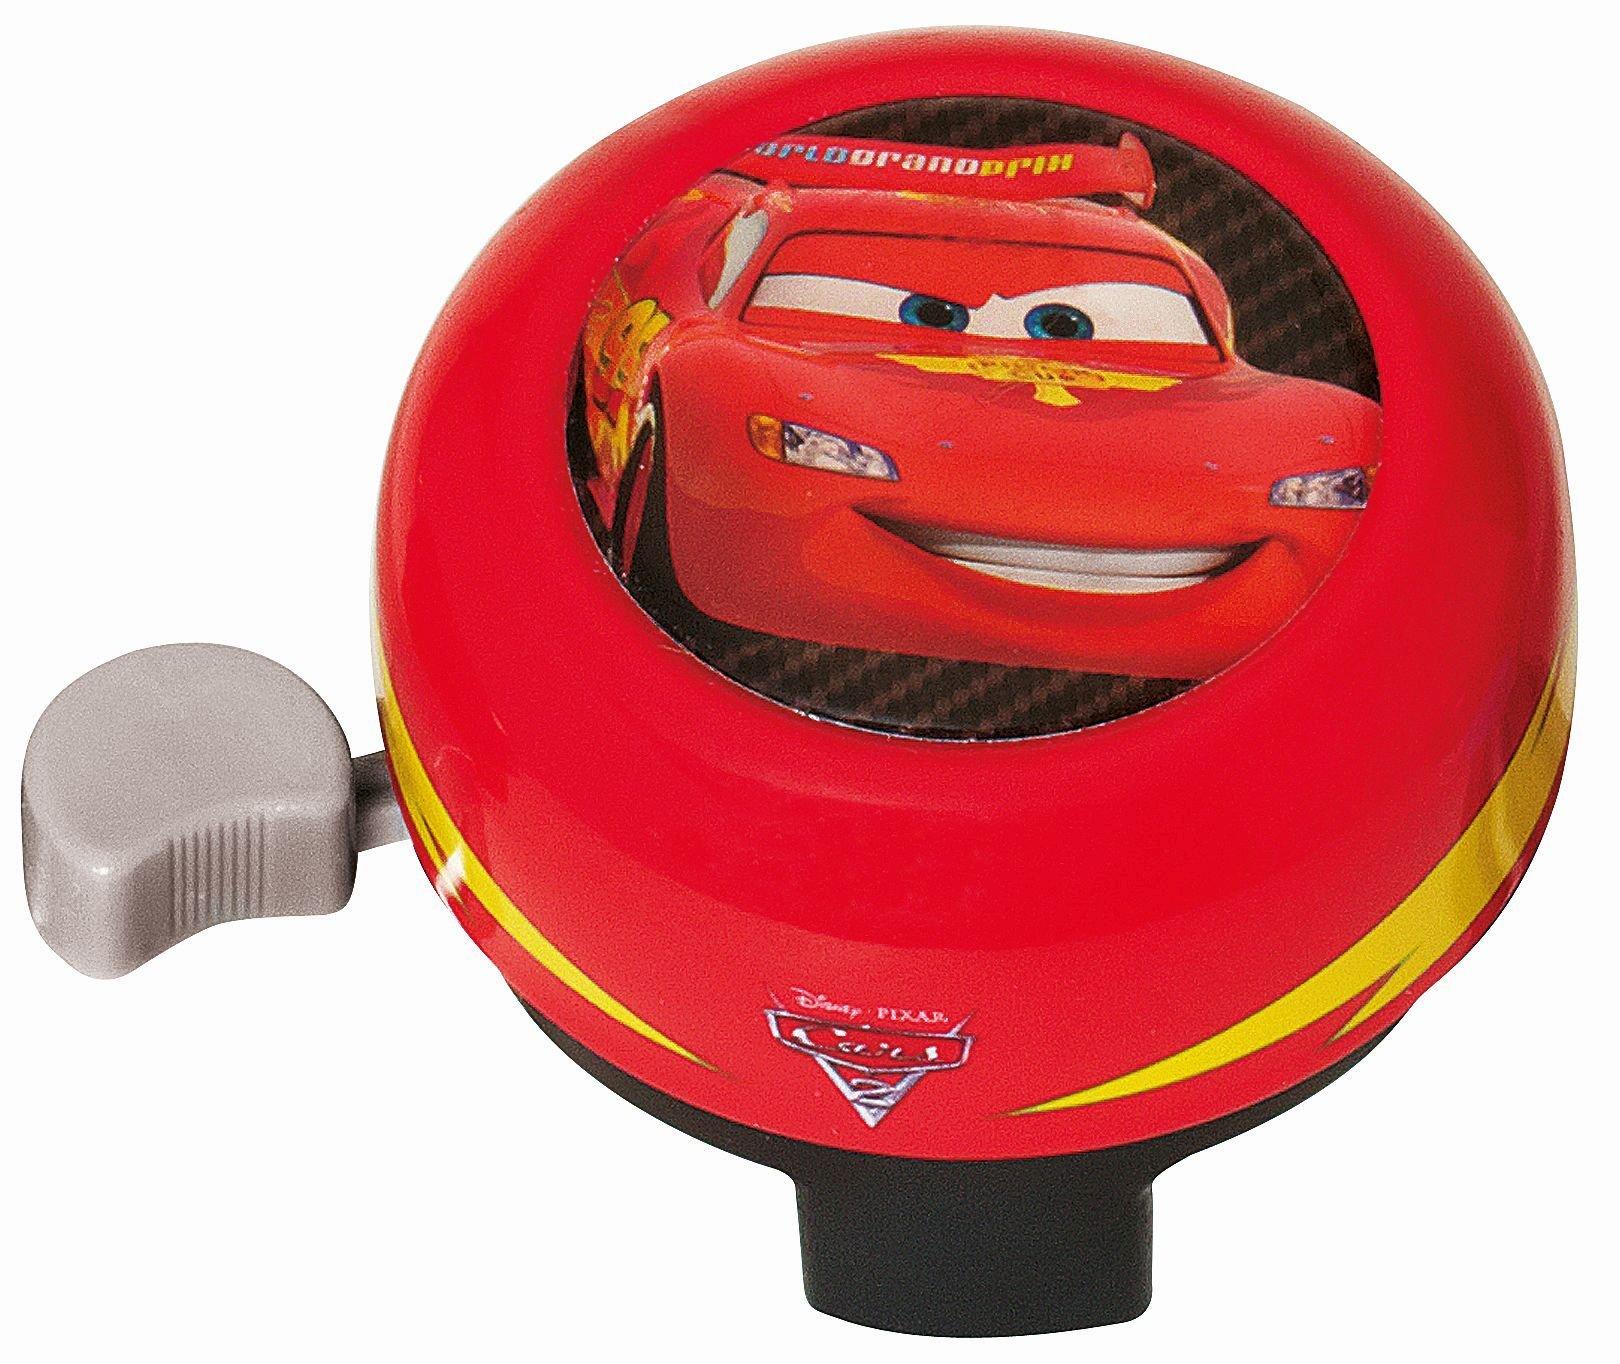 klingeln, glocken & hupen/Kinderartikel: Mattel  Klingel Cars